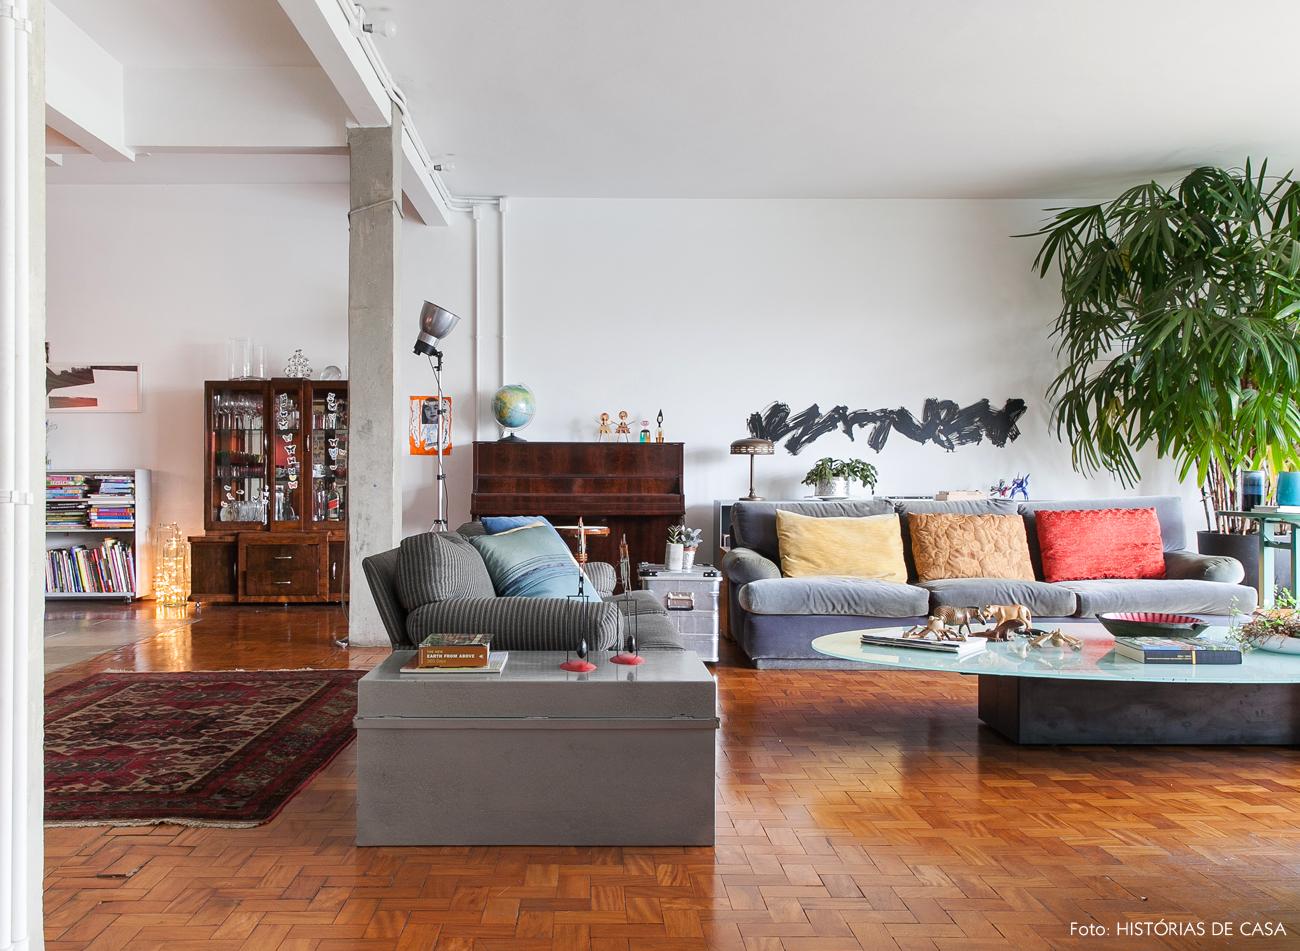 01-decoracao-sala-estar-integrada-pilares-concreto